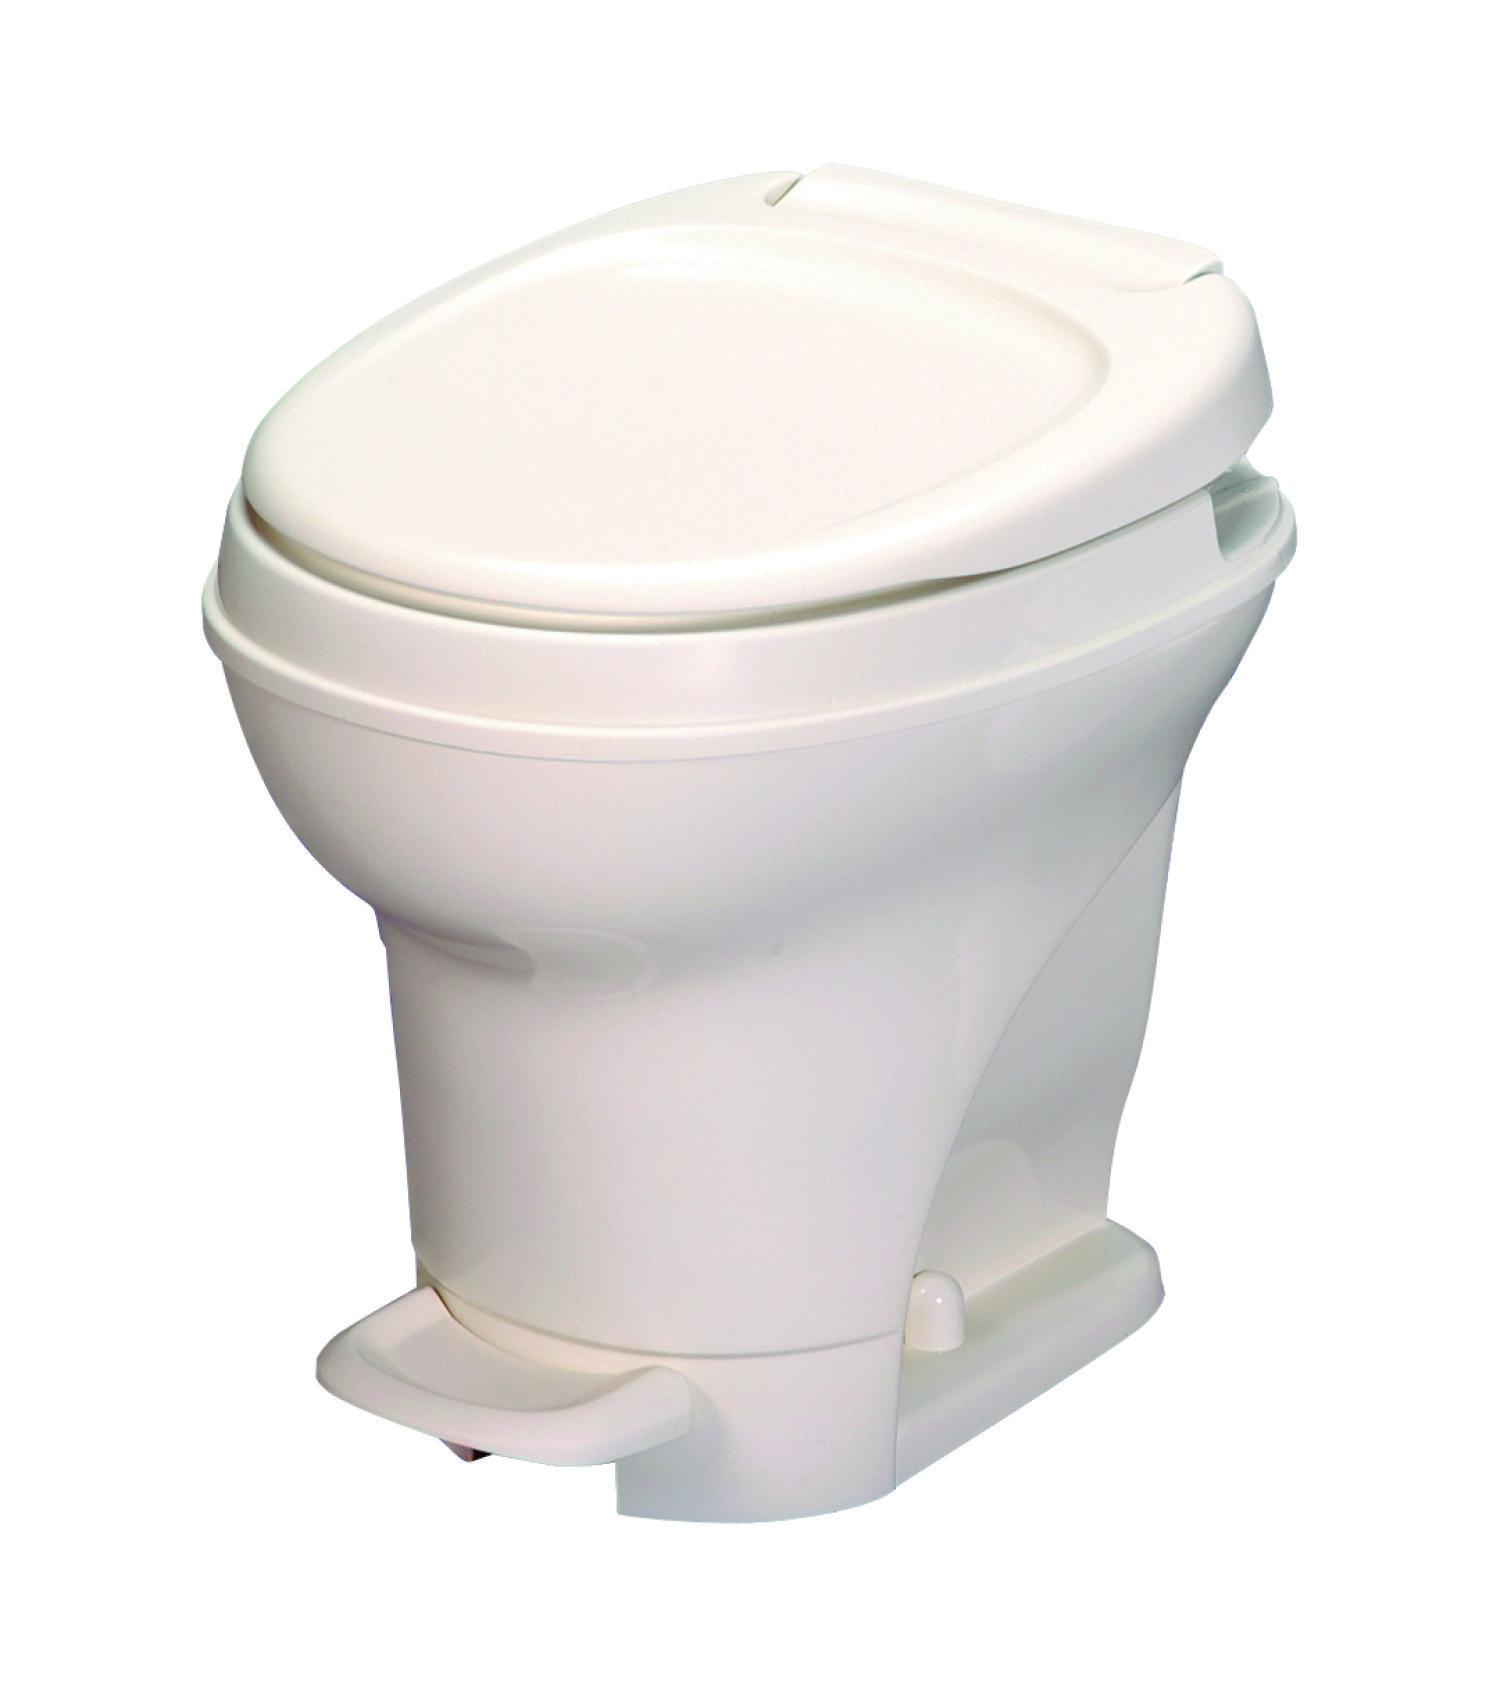 thetford 31671 aquamagic v toilet high pedal flush white ebay. Black Bedroom Furniture Sets. Home Design Ideas